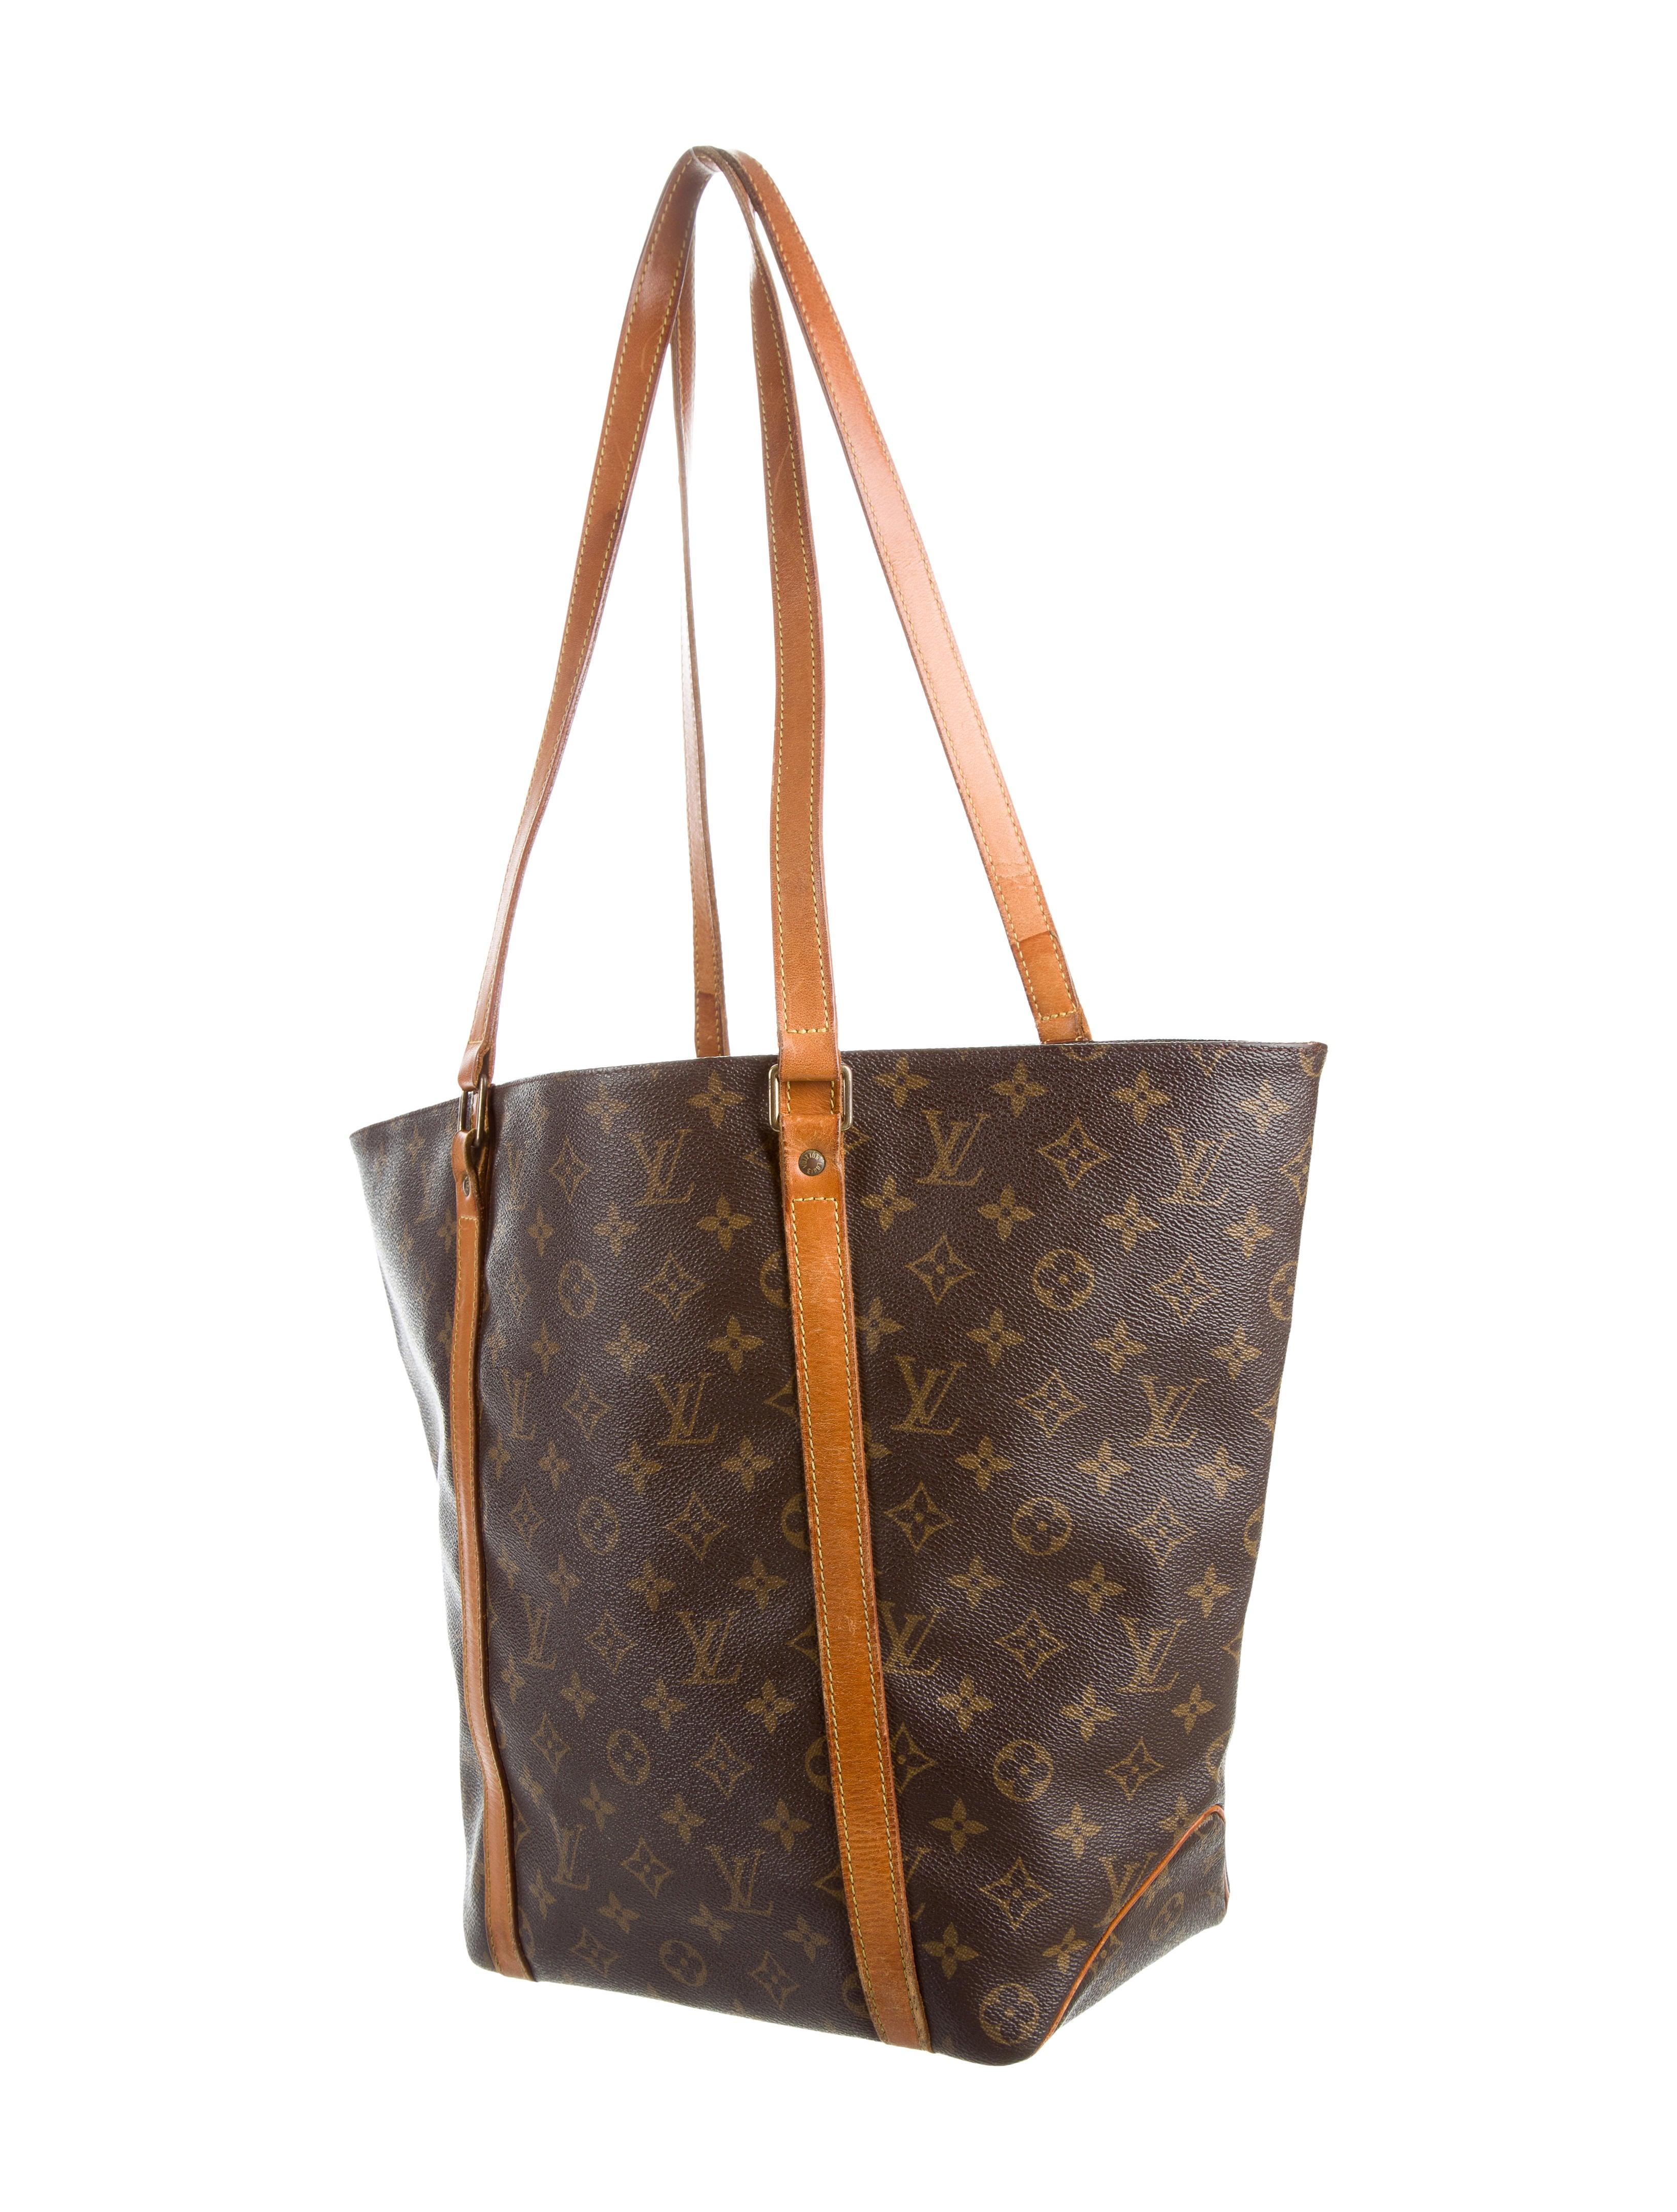 Sac Louis Vuitton Matelassé : Louis vuitton monogram sac ping tote handbags